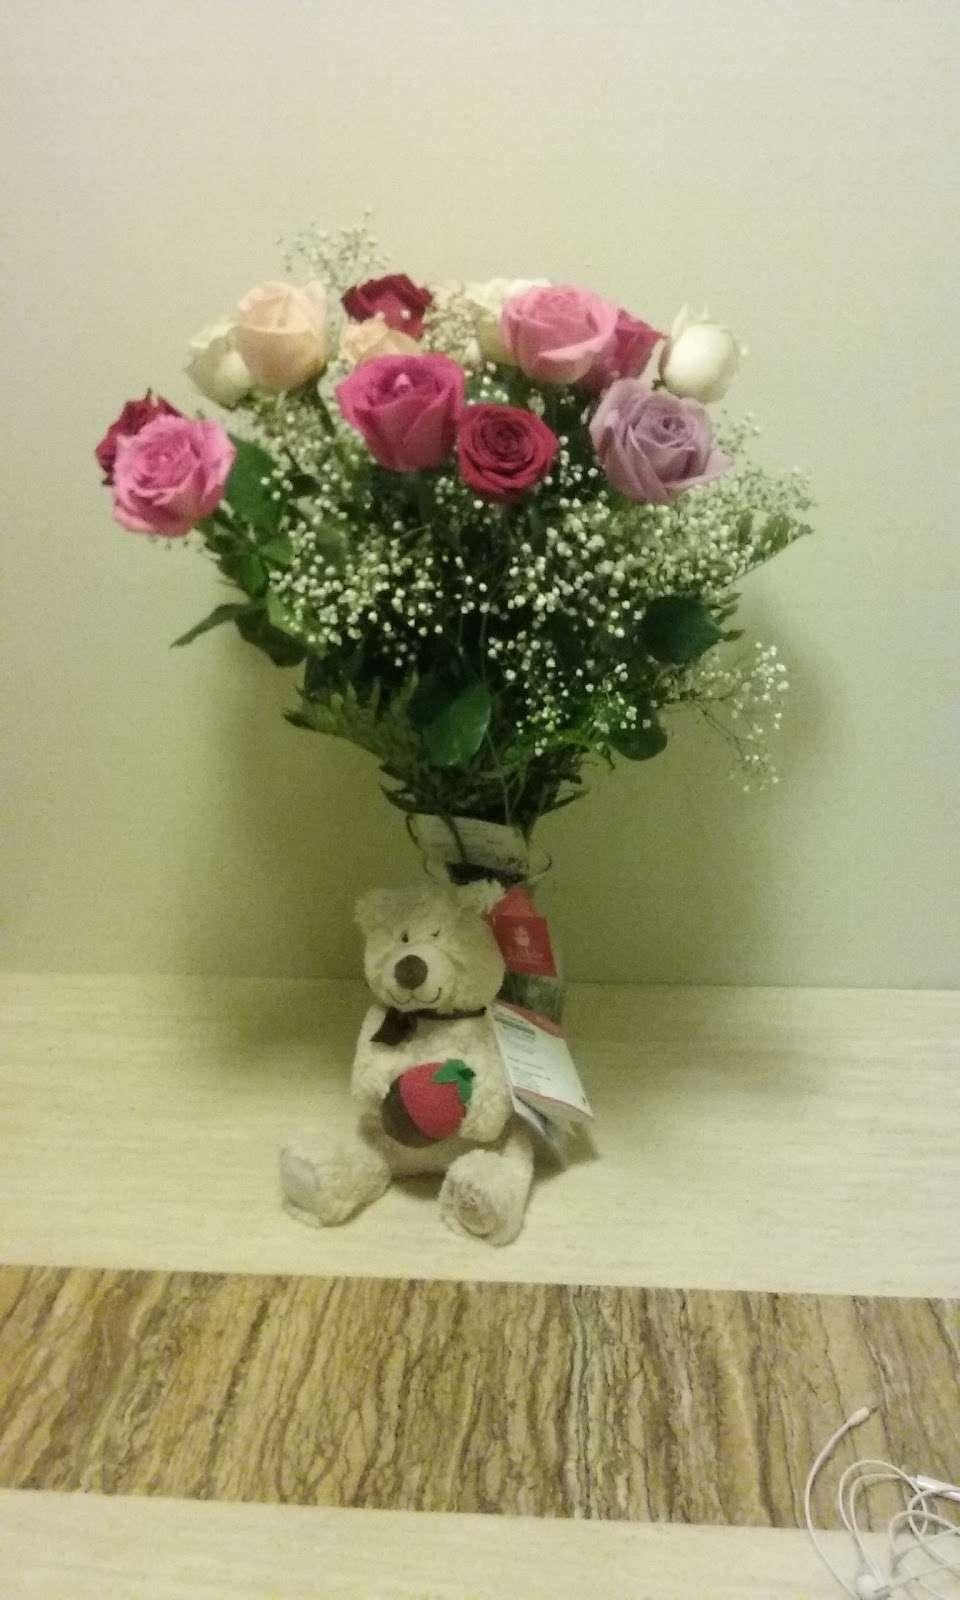 Creative Florist - florist    Photo 4 of 10   Address: 93-01 63rd Dr, Rego Park, NY 11374, USA   Phone: (718) 459-9292